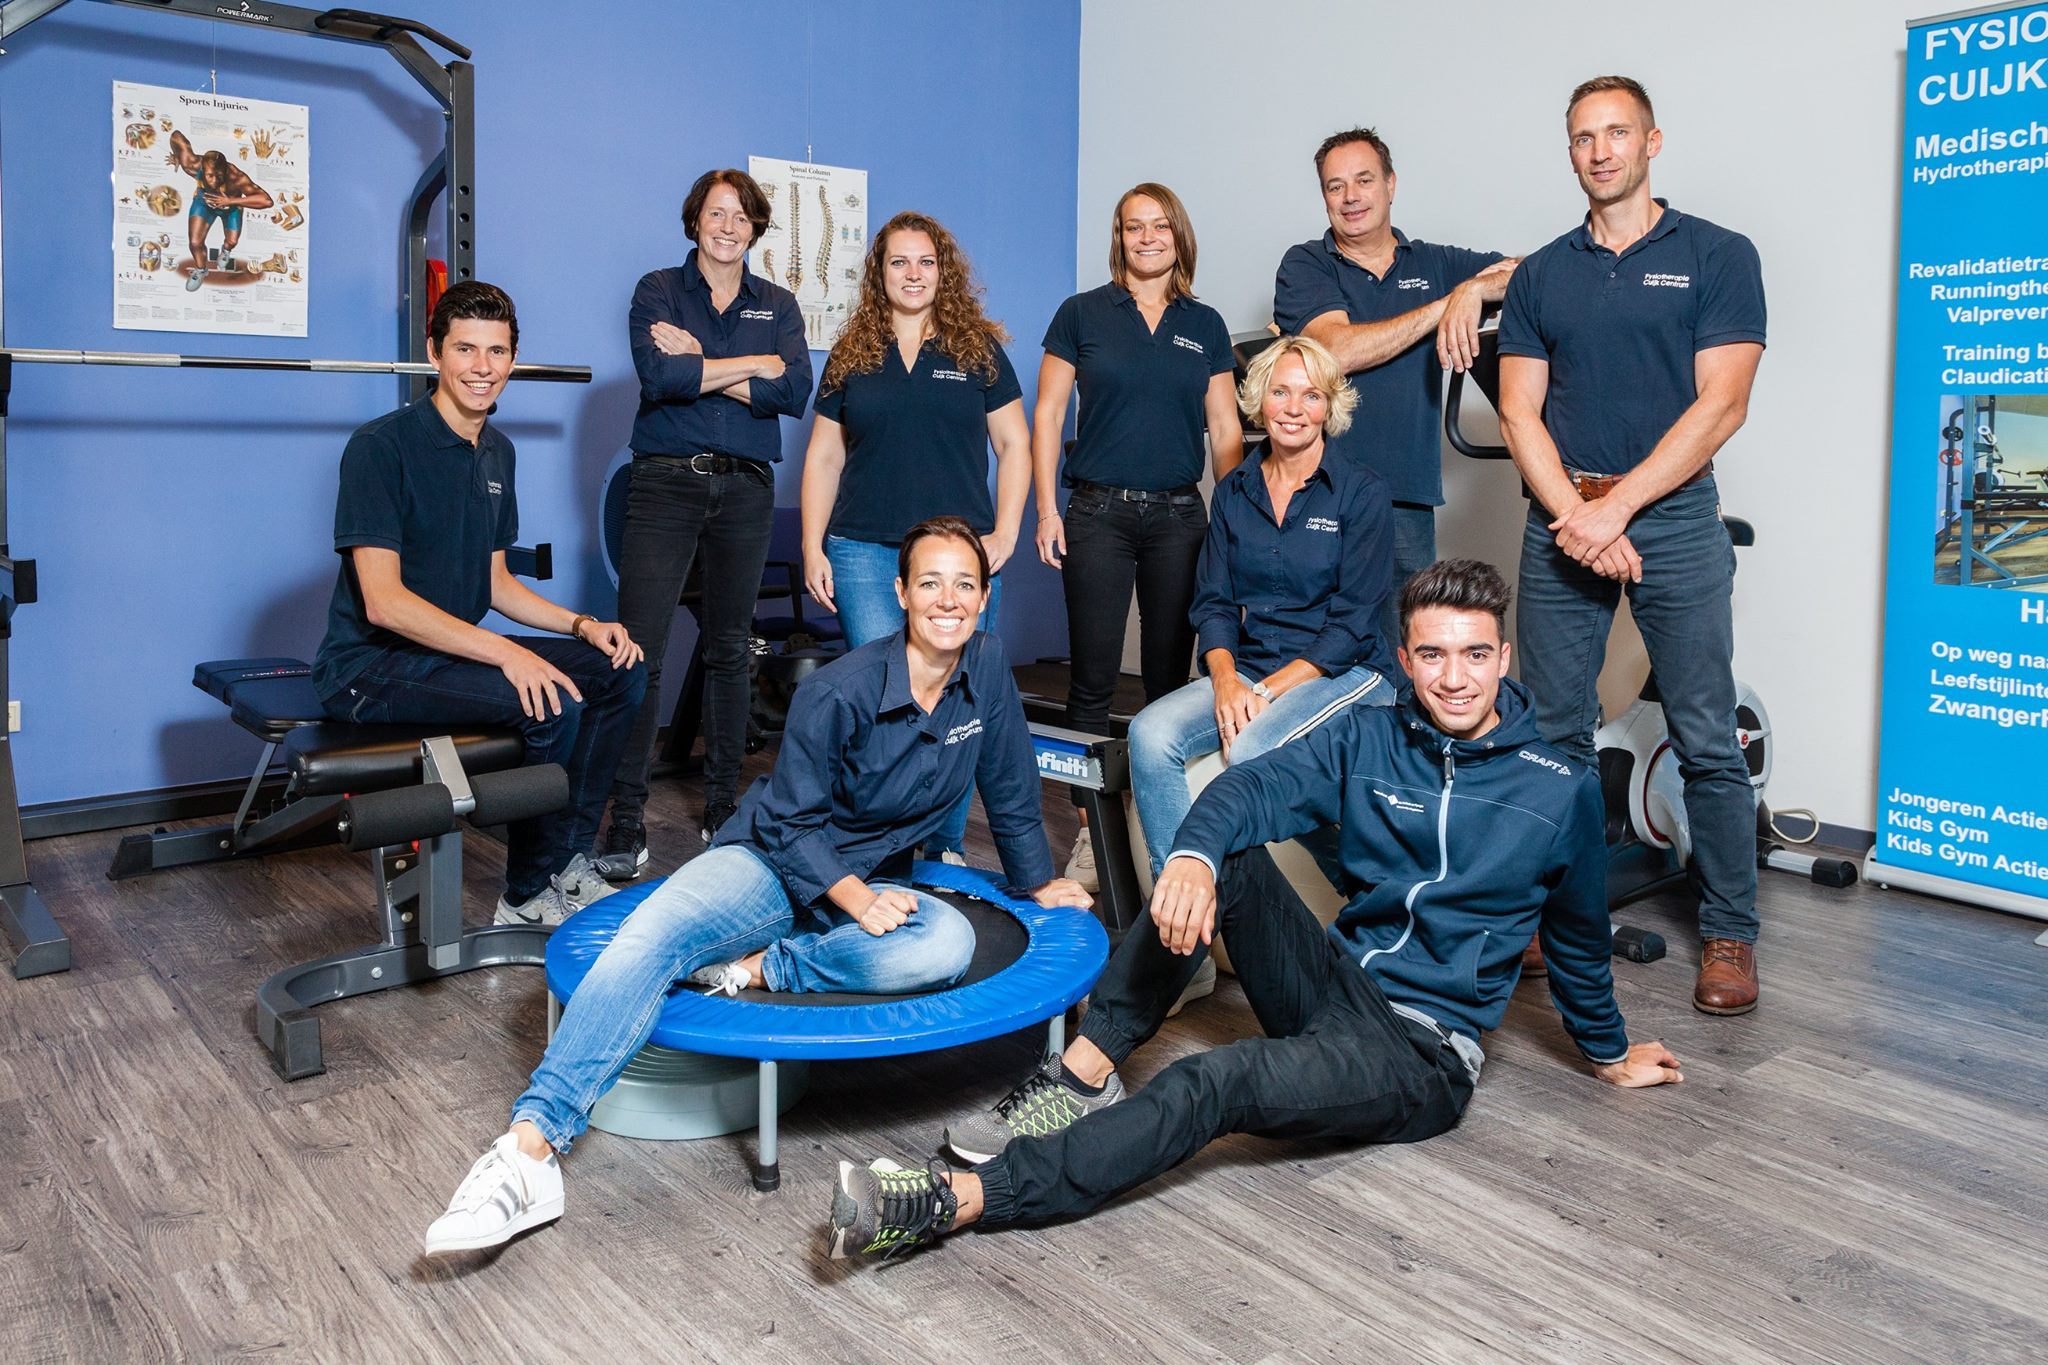 Team | Fysiotherapie Cuijk Centrum